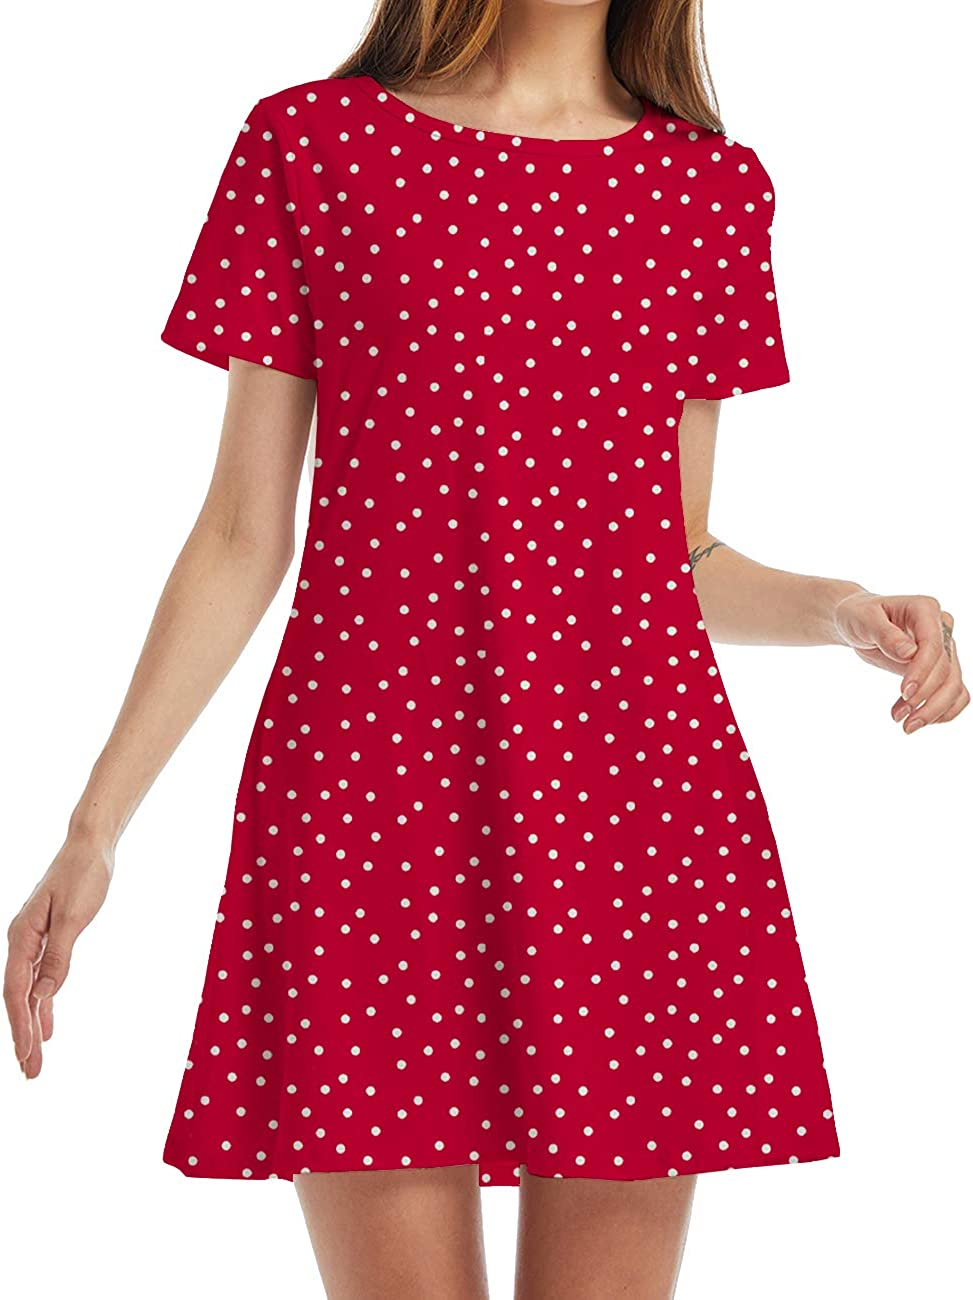 YIKUSO Women's Summer Casual Loose Tshirt Dresses Short Sleeve Boho Beach Dress